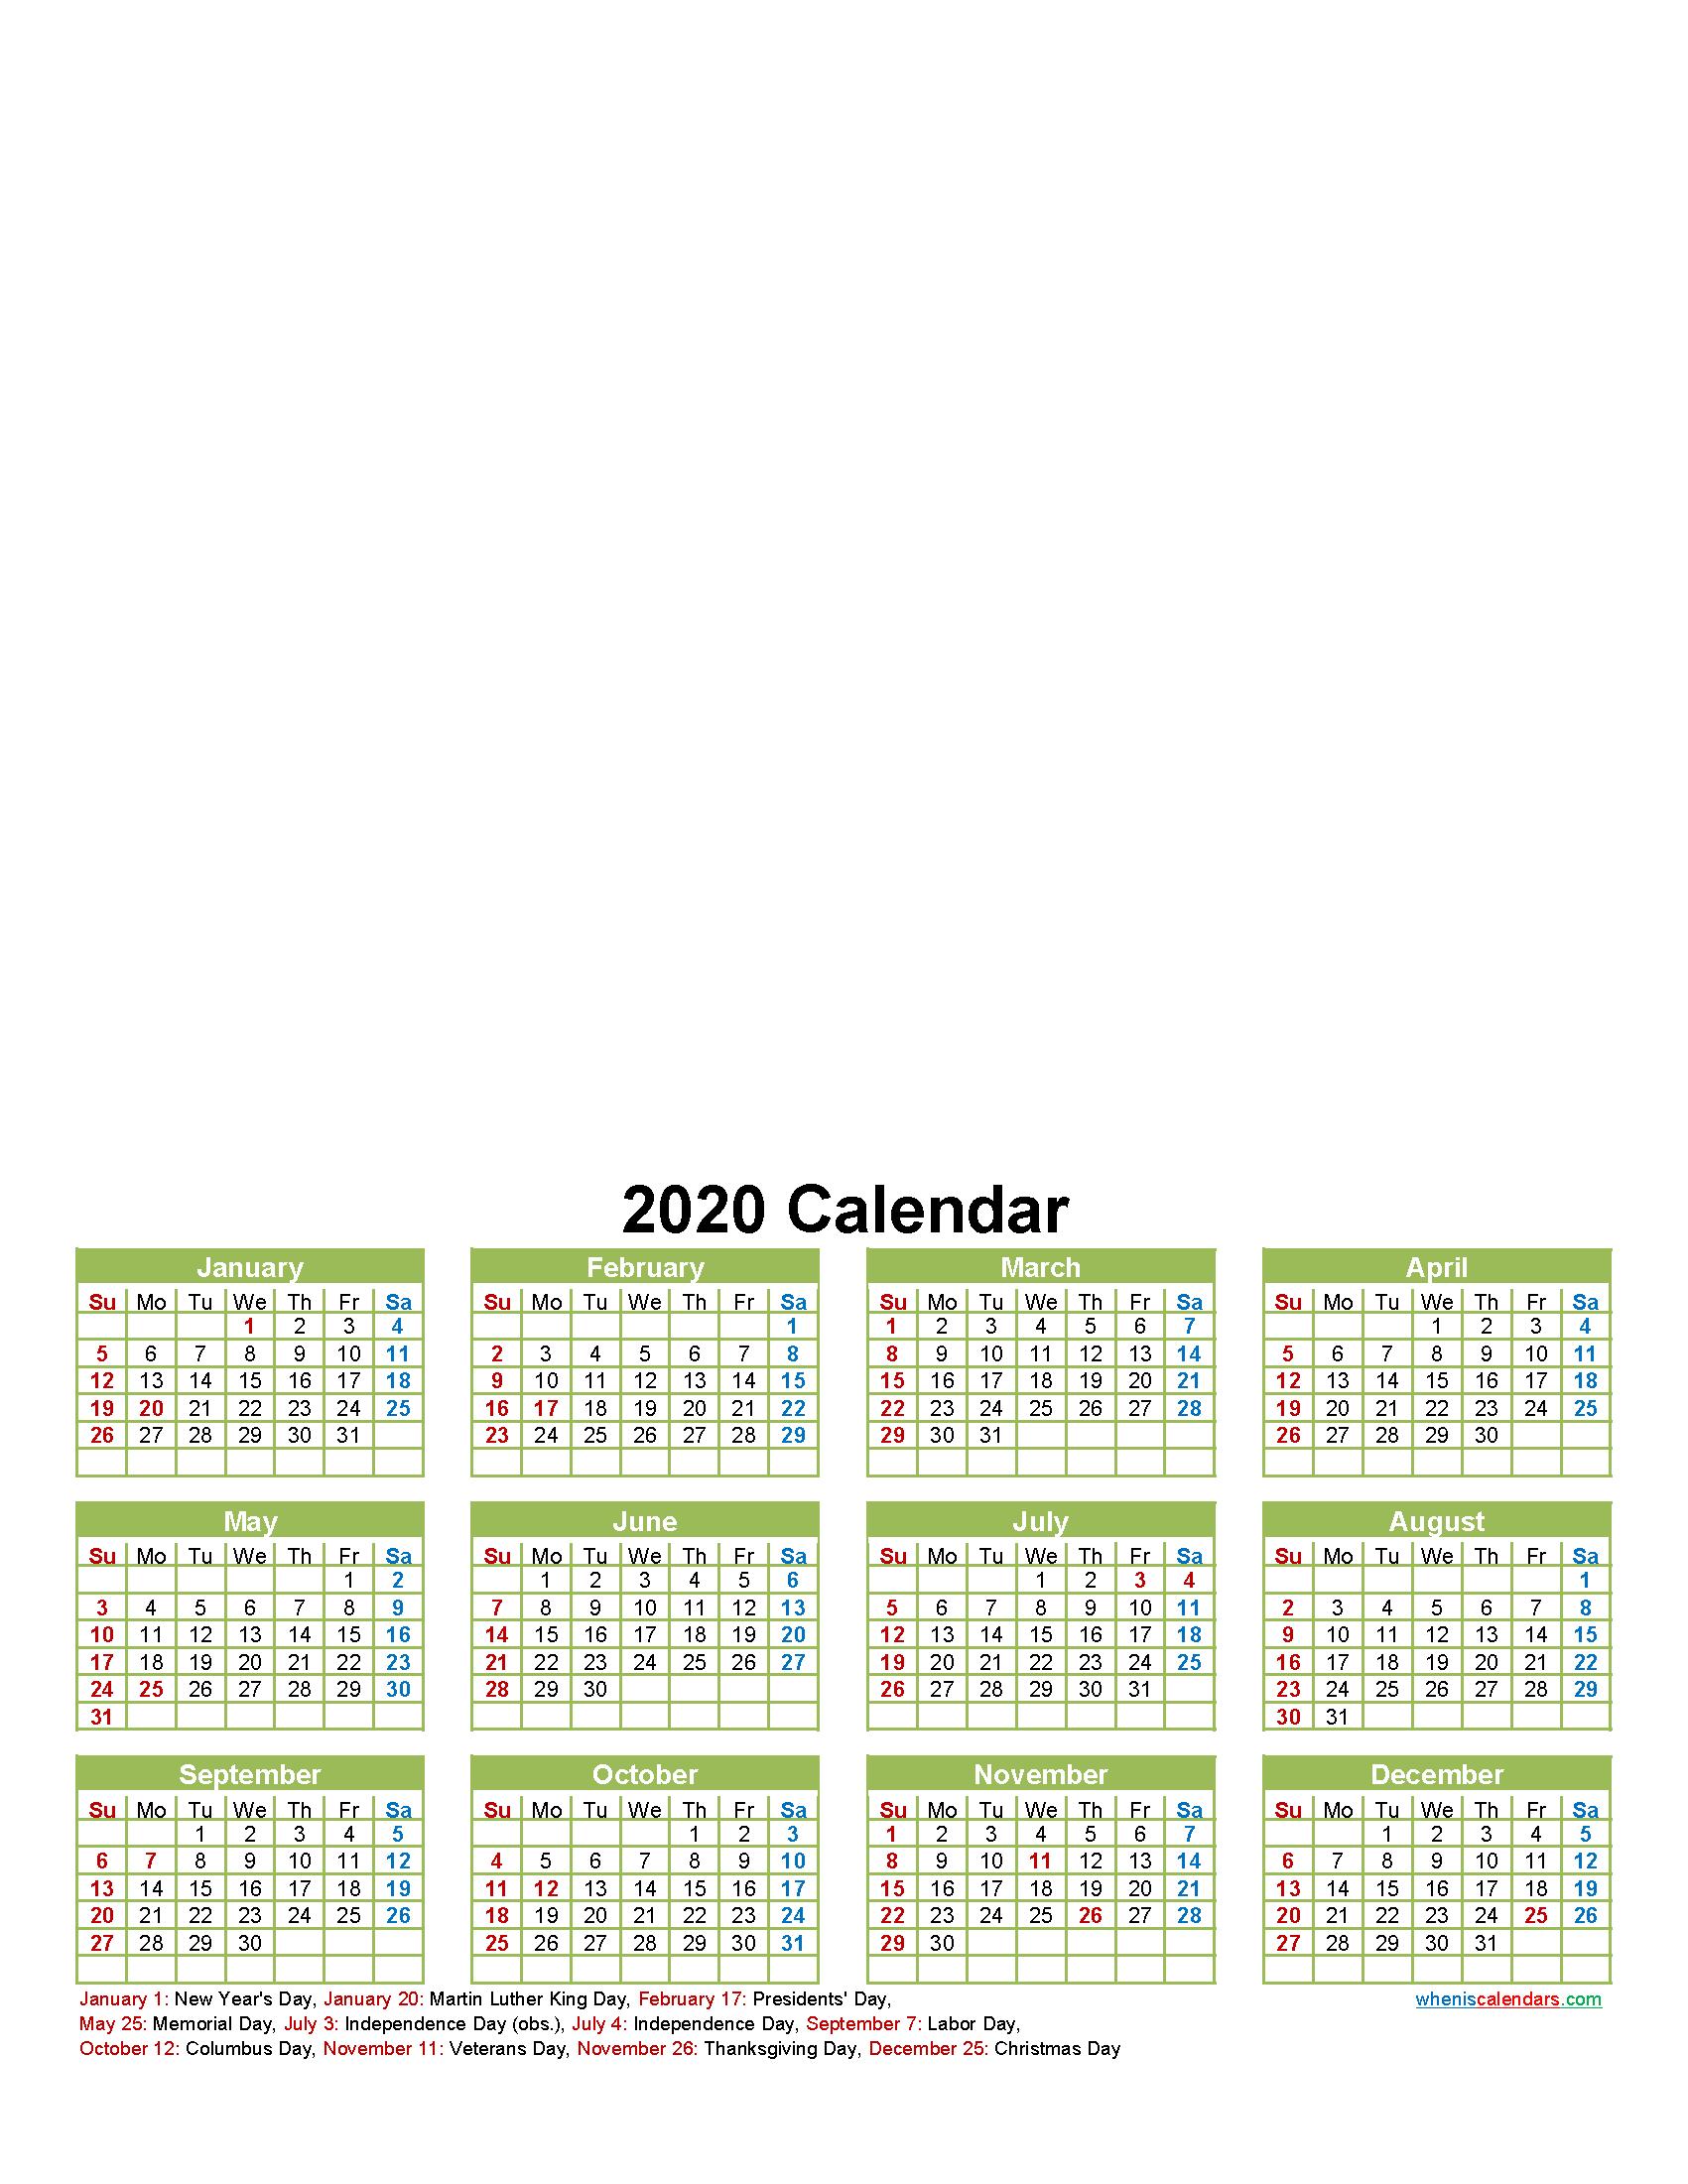 Personalised Photo Calendar 2020